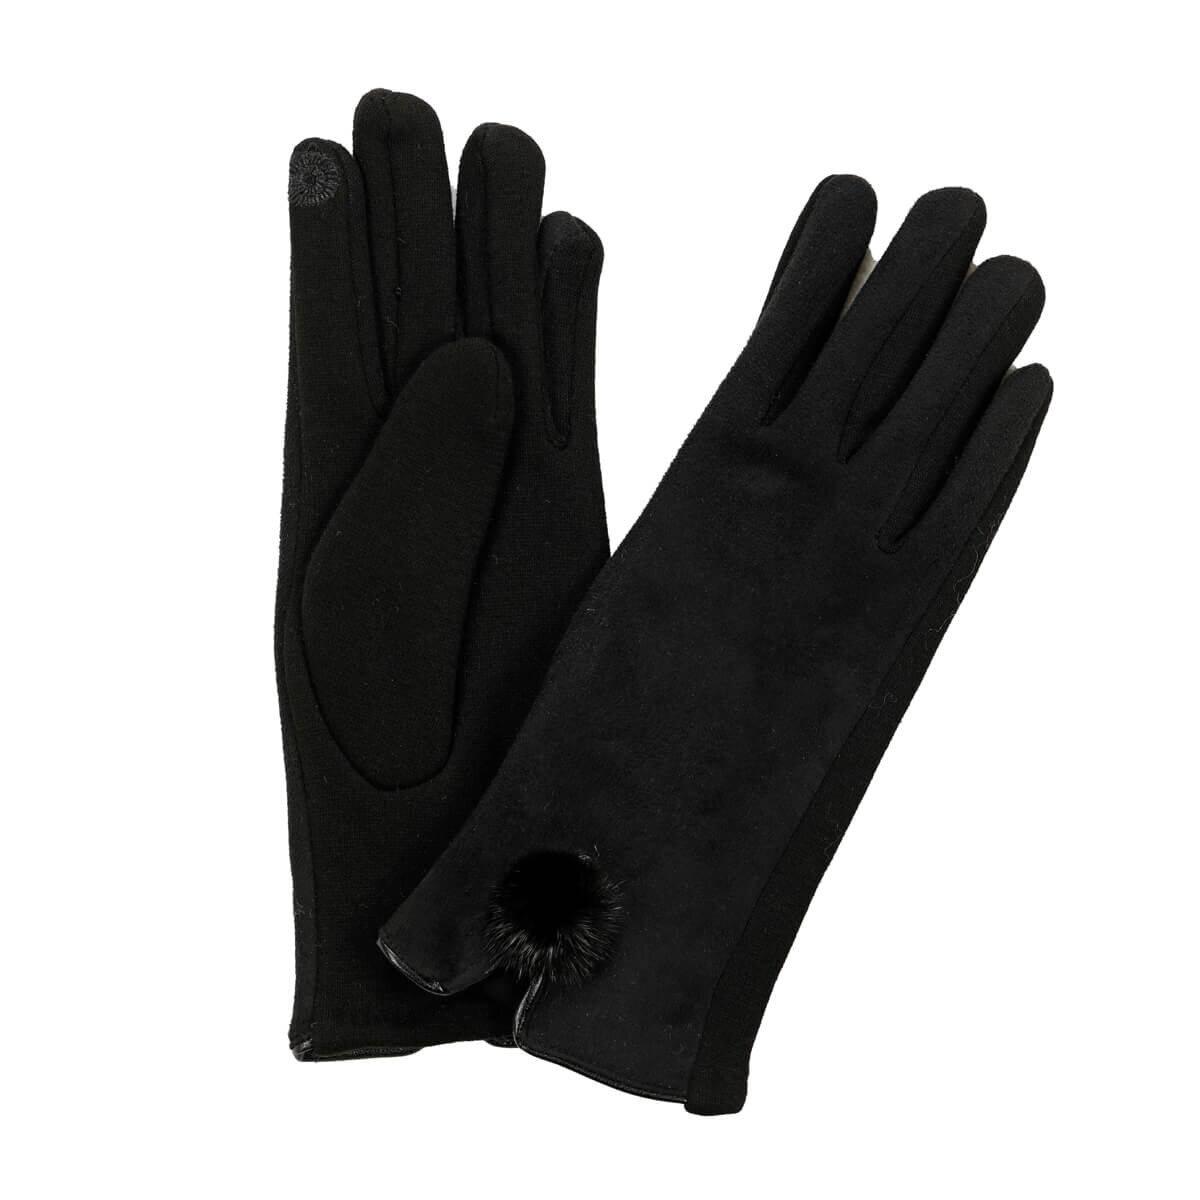 FLO BLACK POMPON GLOVES Black Women 'S Gloves Miss F